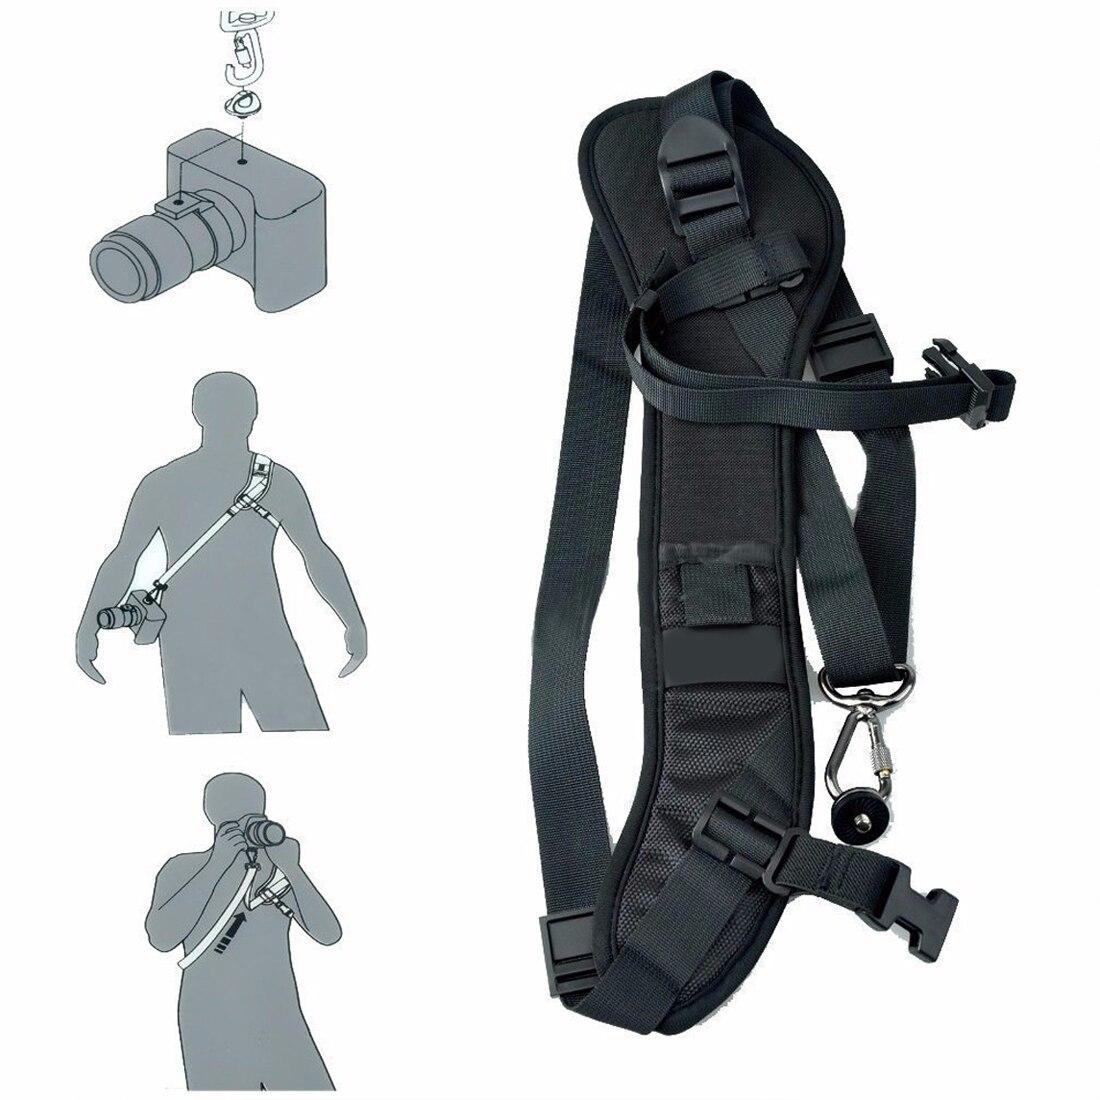 Centechia Good SALE Foucs F1 Quick Rapid Camera Single Shoulder Sling Black Strap For DSLR Camera